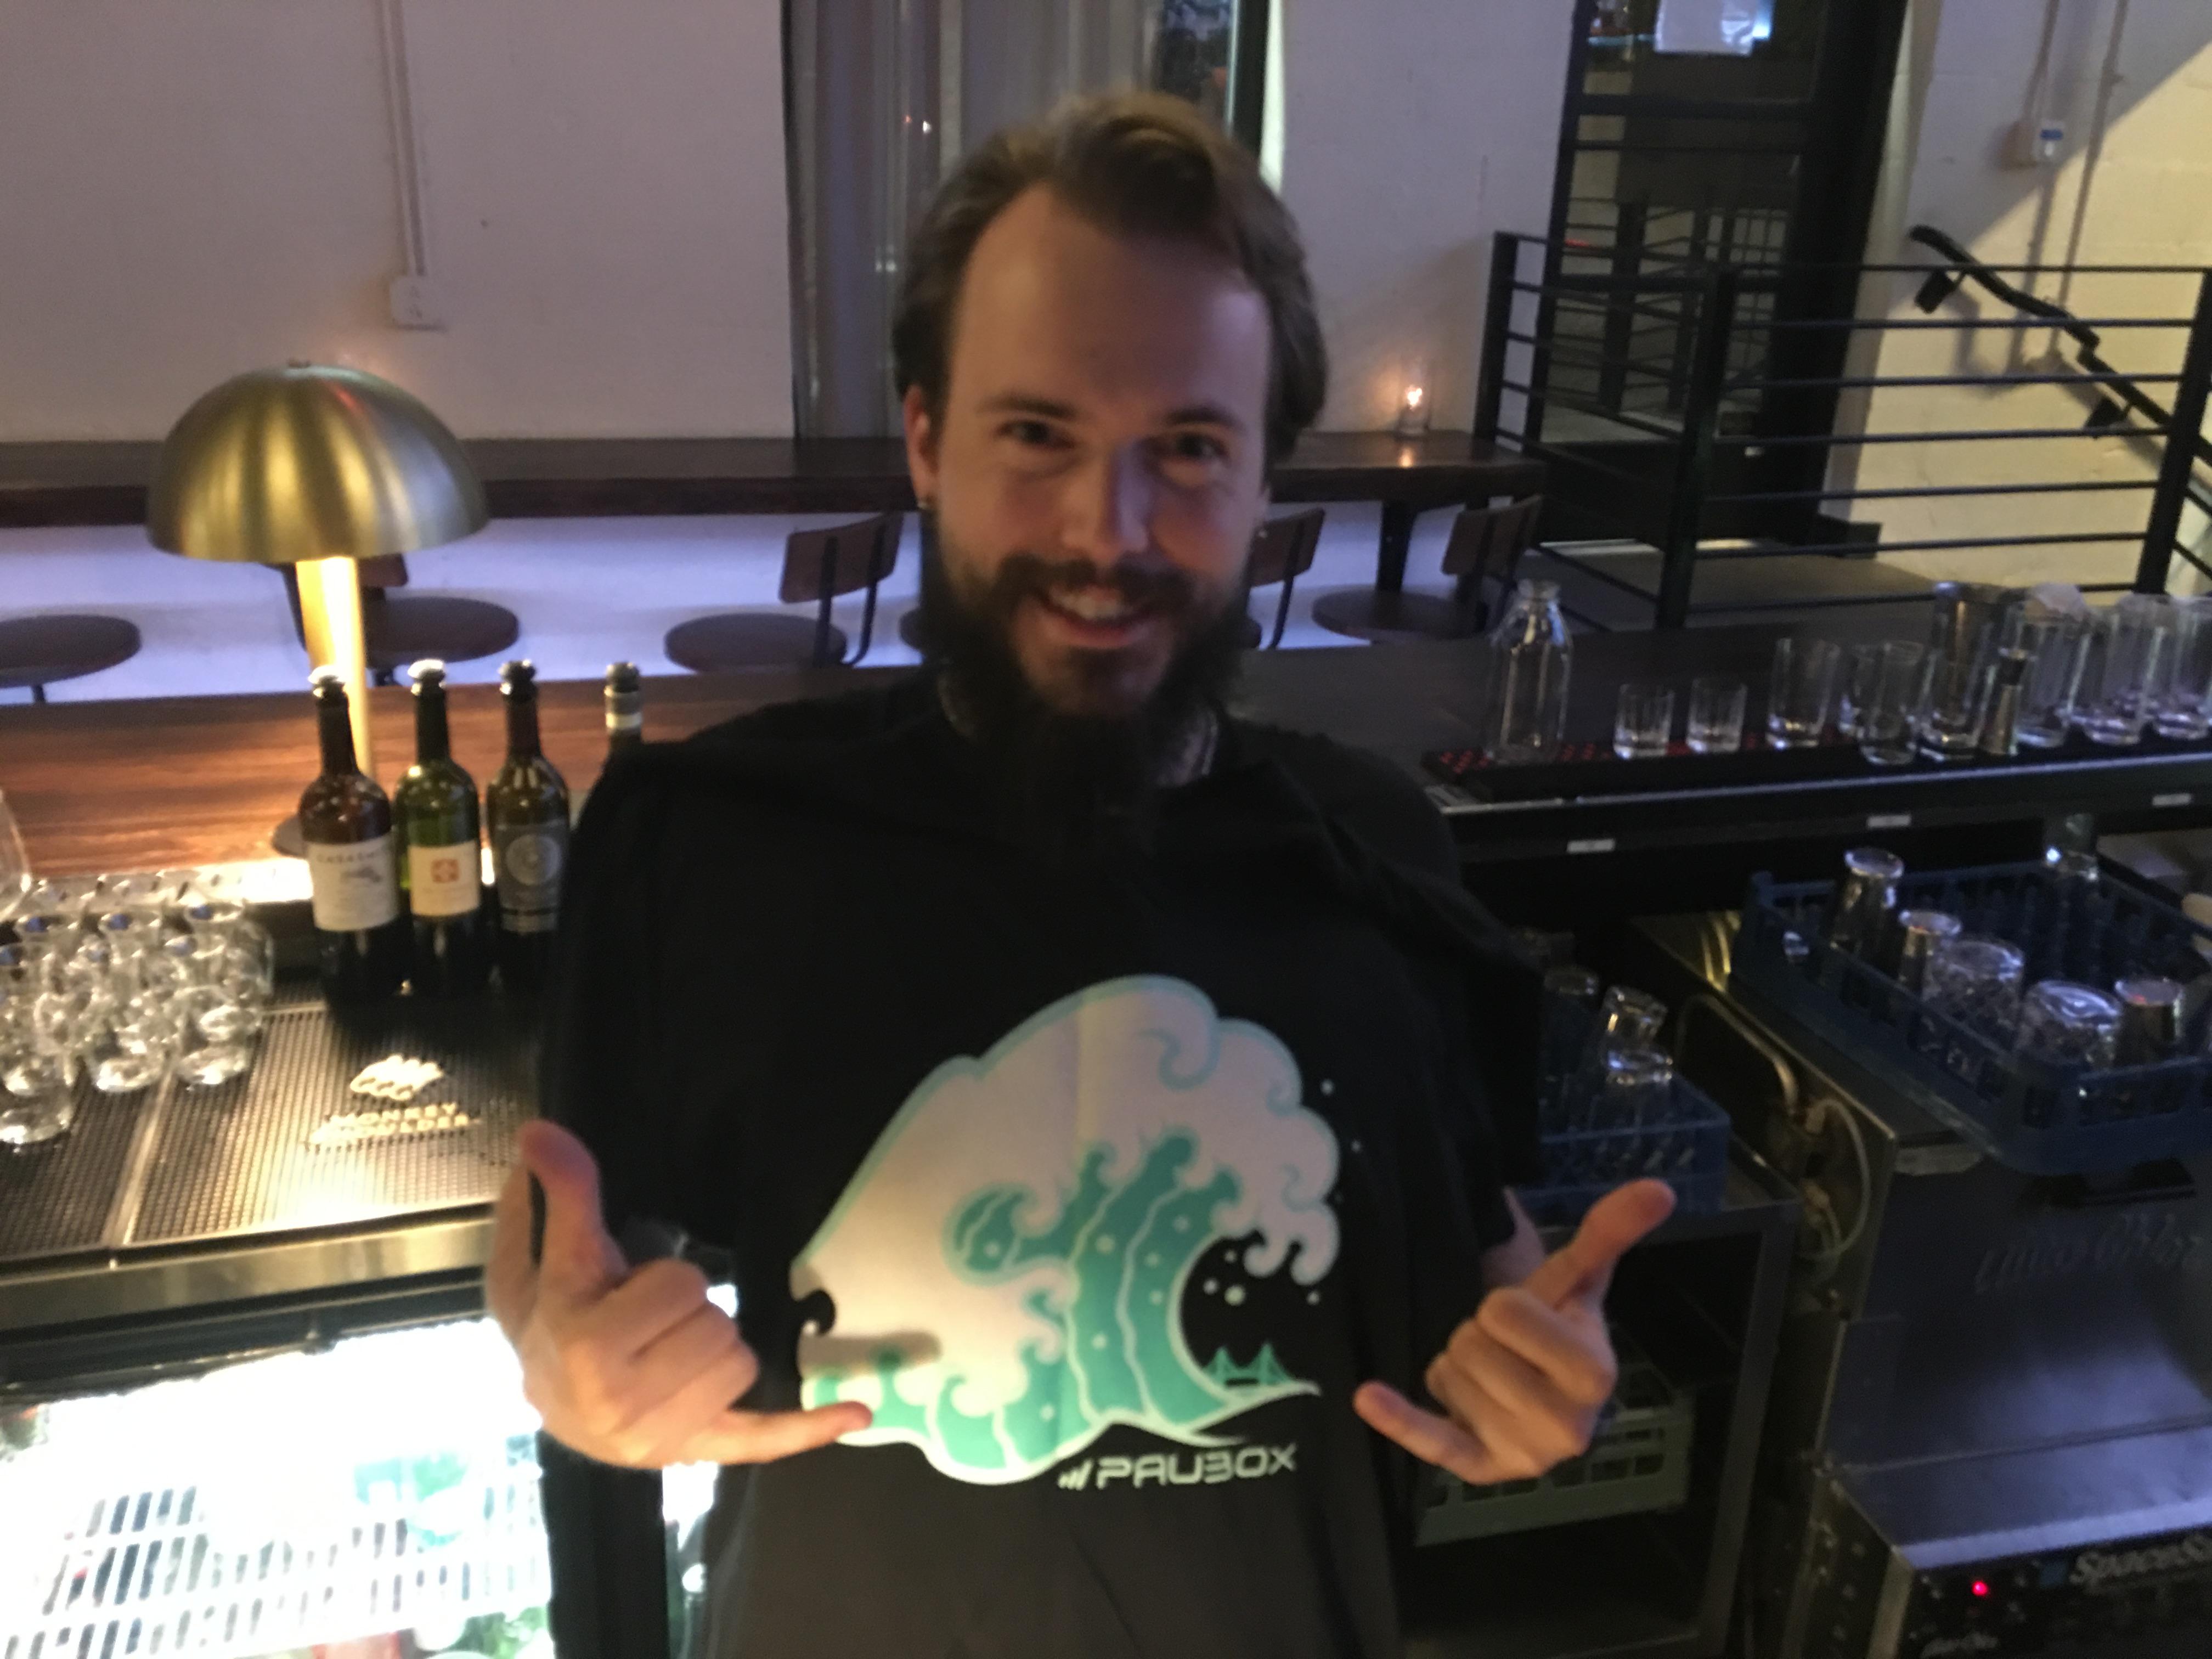 Nashville Social Mixer at 404 Kitchen - Our bartender Cameron took care of us